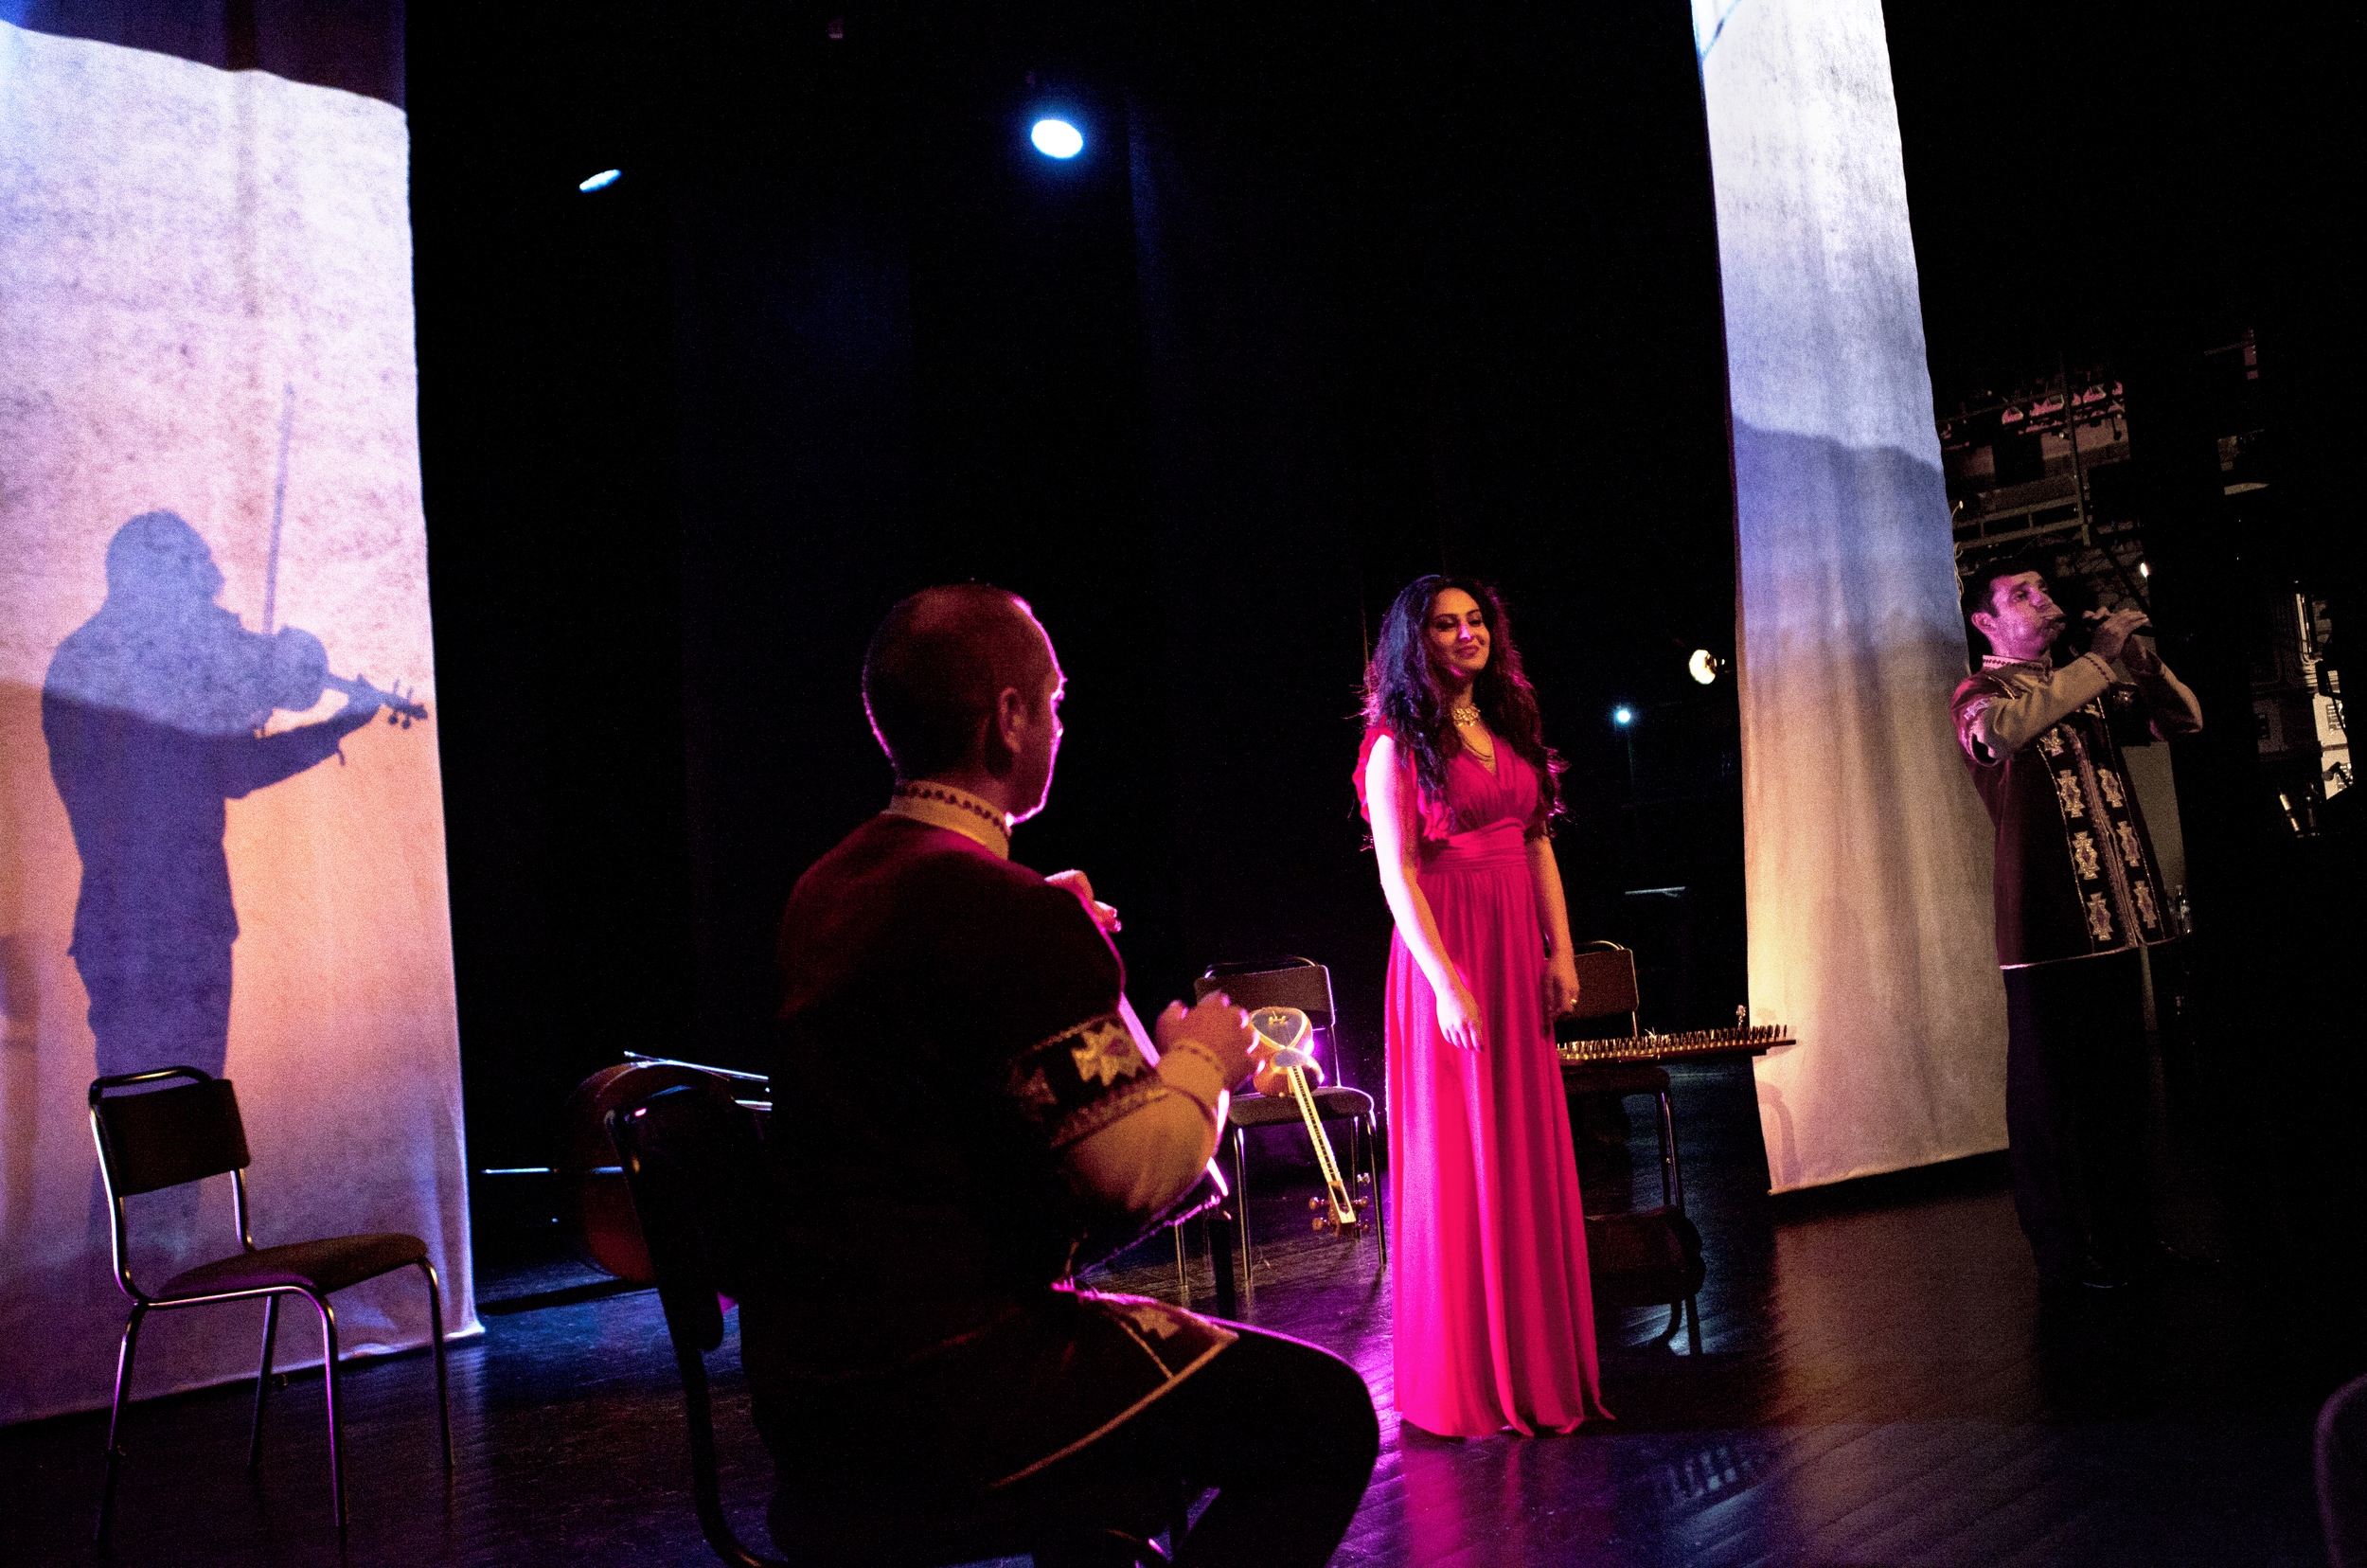 talent - teatersalen - 4. juli - heidi hattestein - IMG_5399.jpg